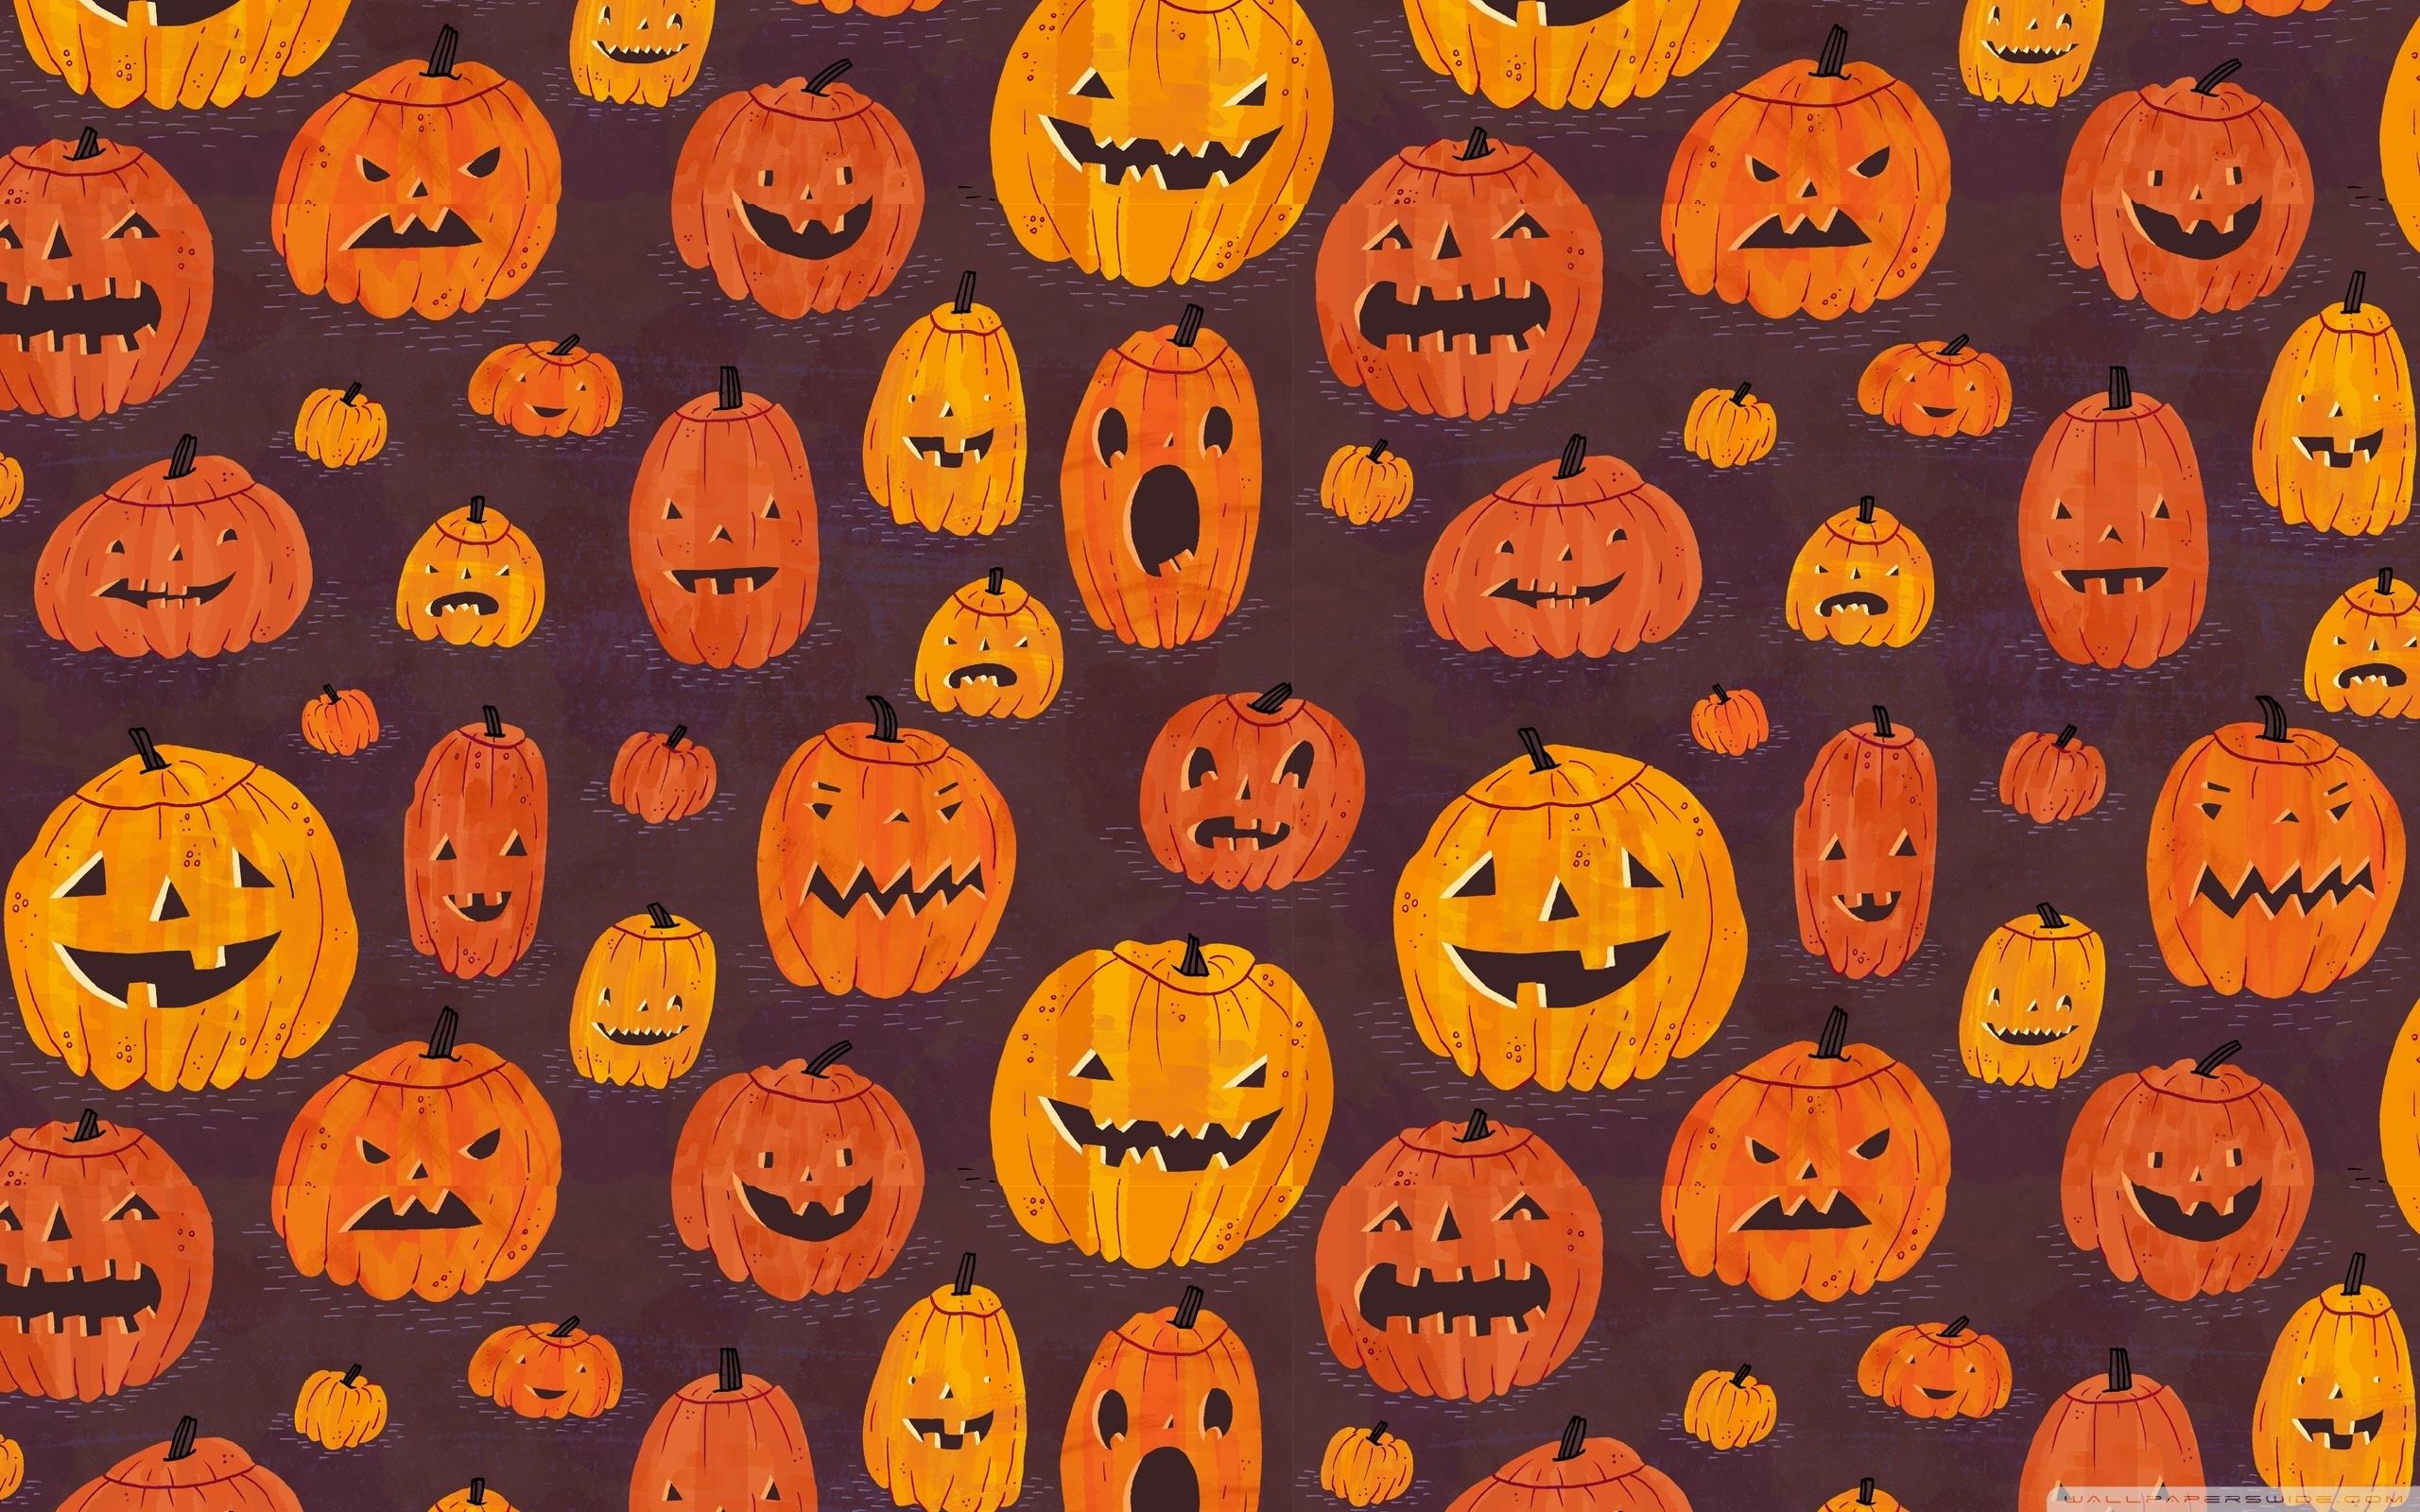 halloween pumpkins pattern ❤ 4k hd desktop wallpaper for 4k ultra